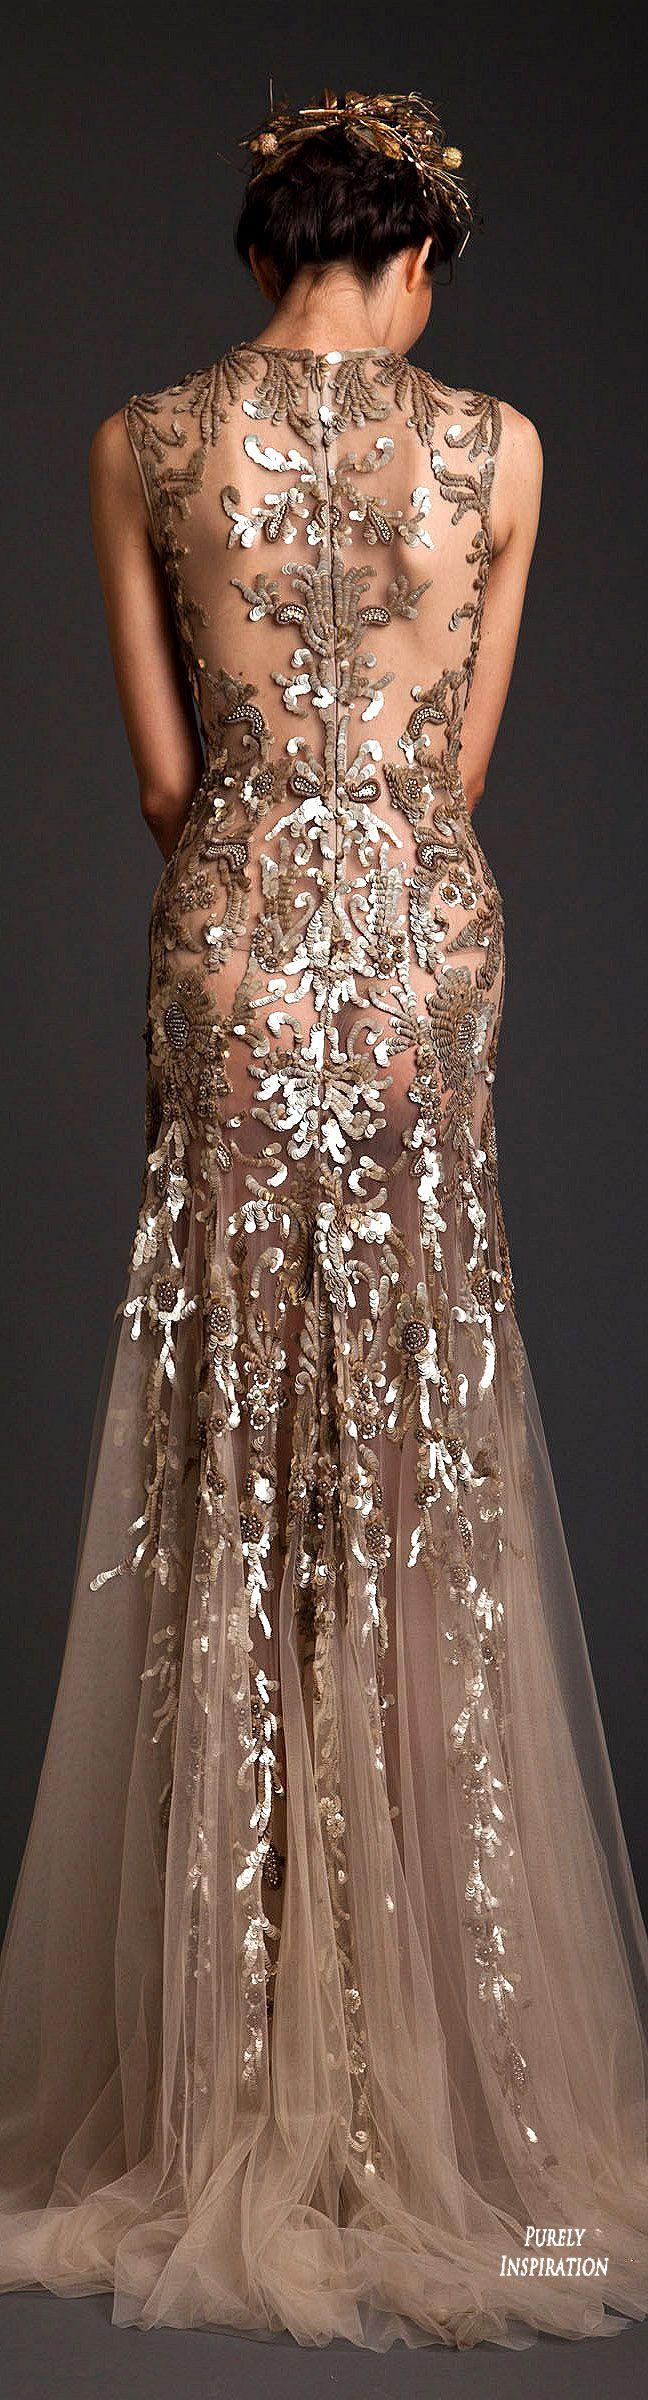 Krikor Jabotian Haute Couture   Purely Inspiration